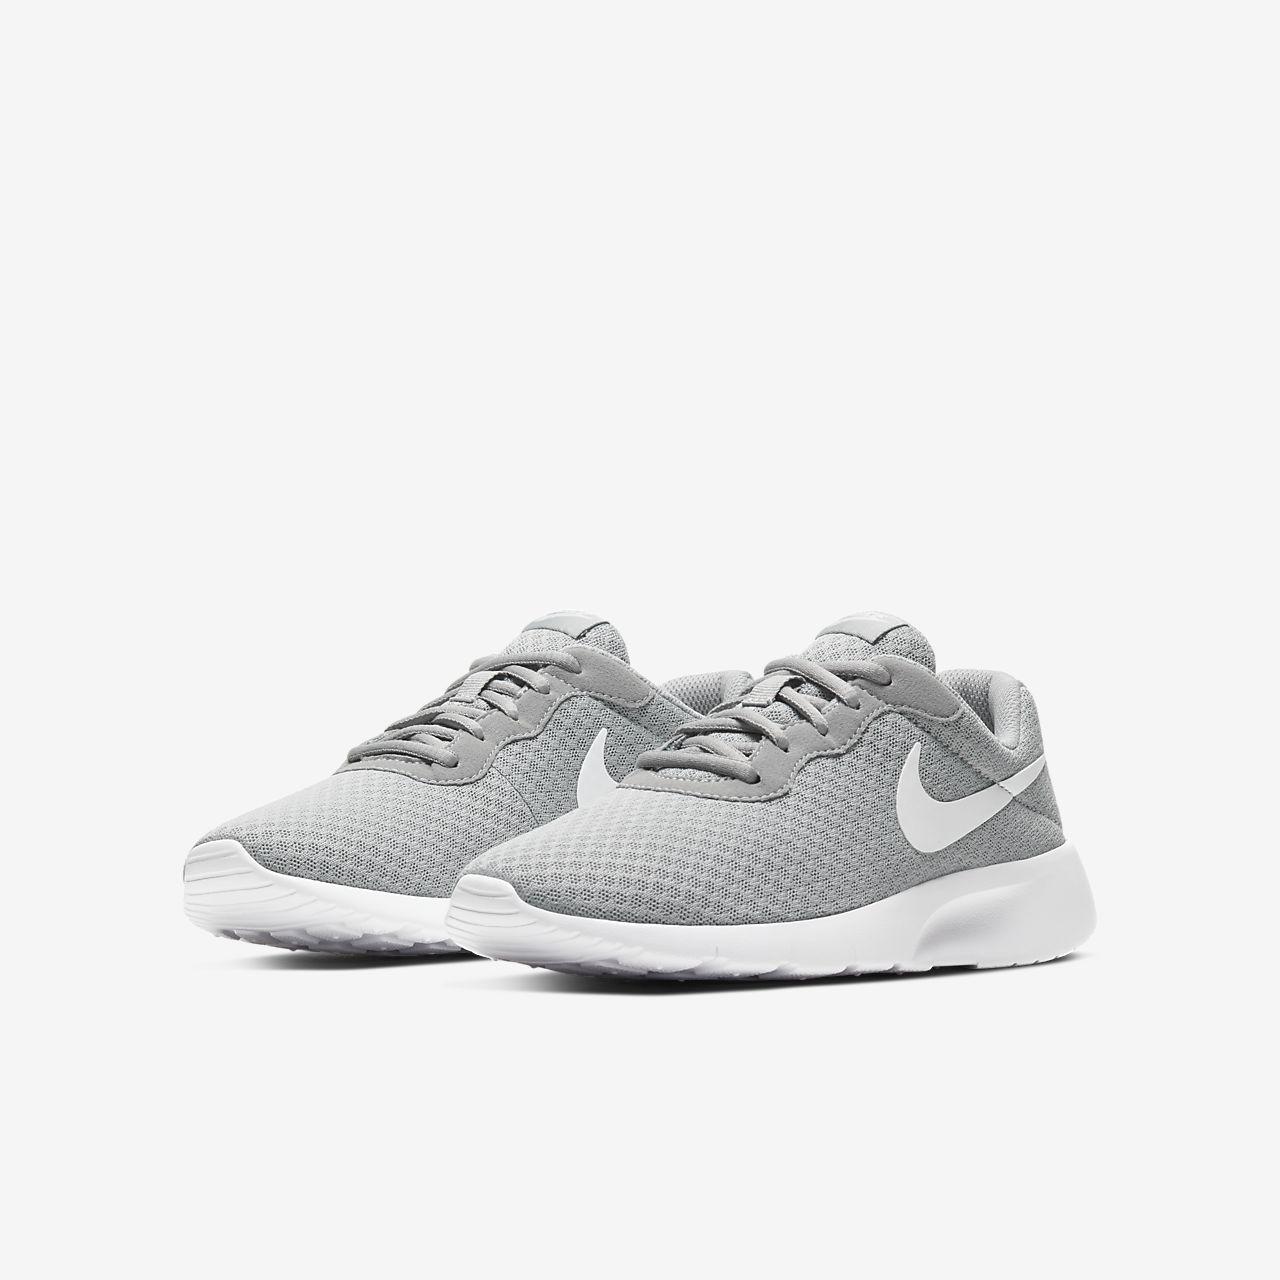 6ba53a3b91073 Nike Tanjun Zapatillas - Niño a. Nike.com ES